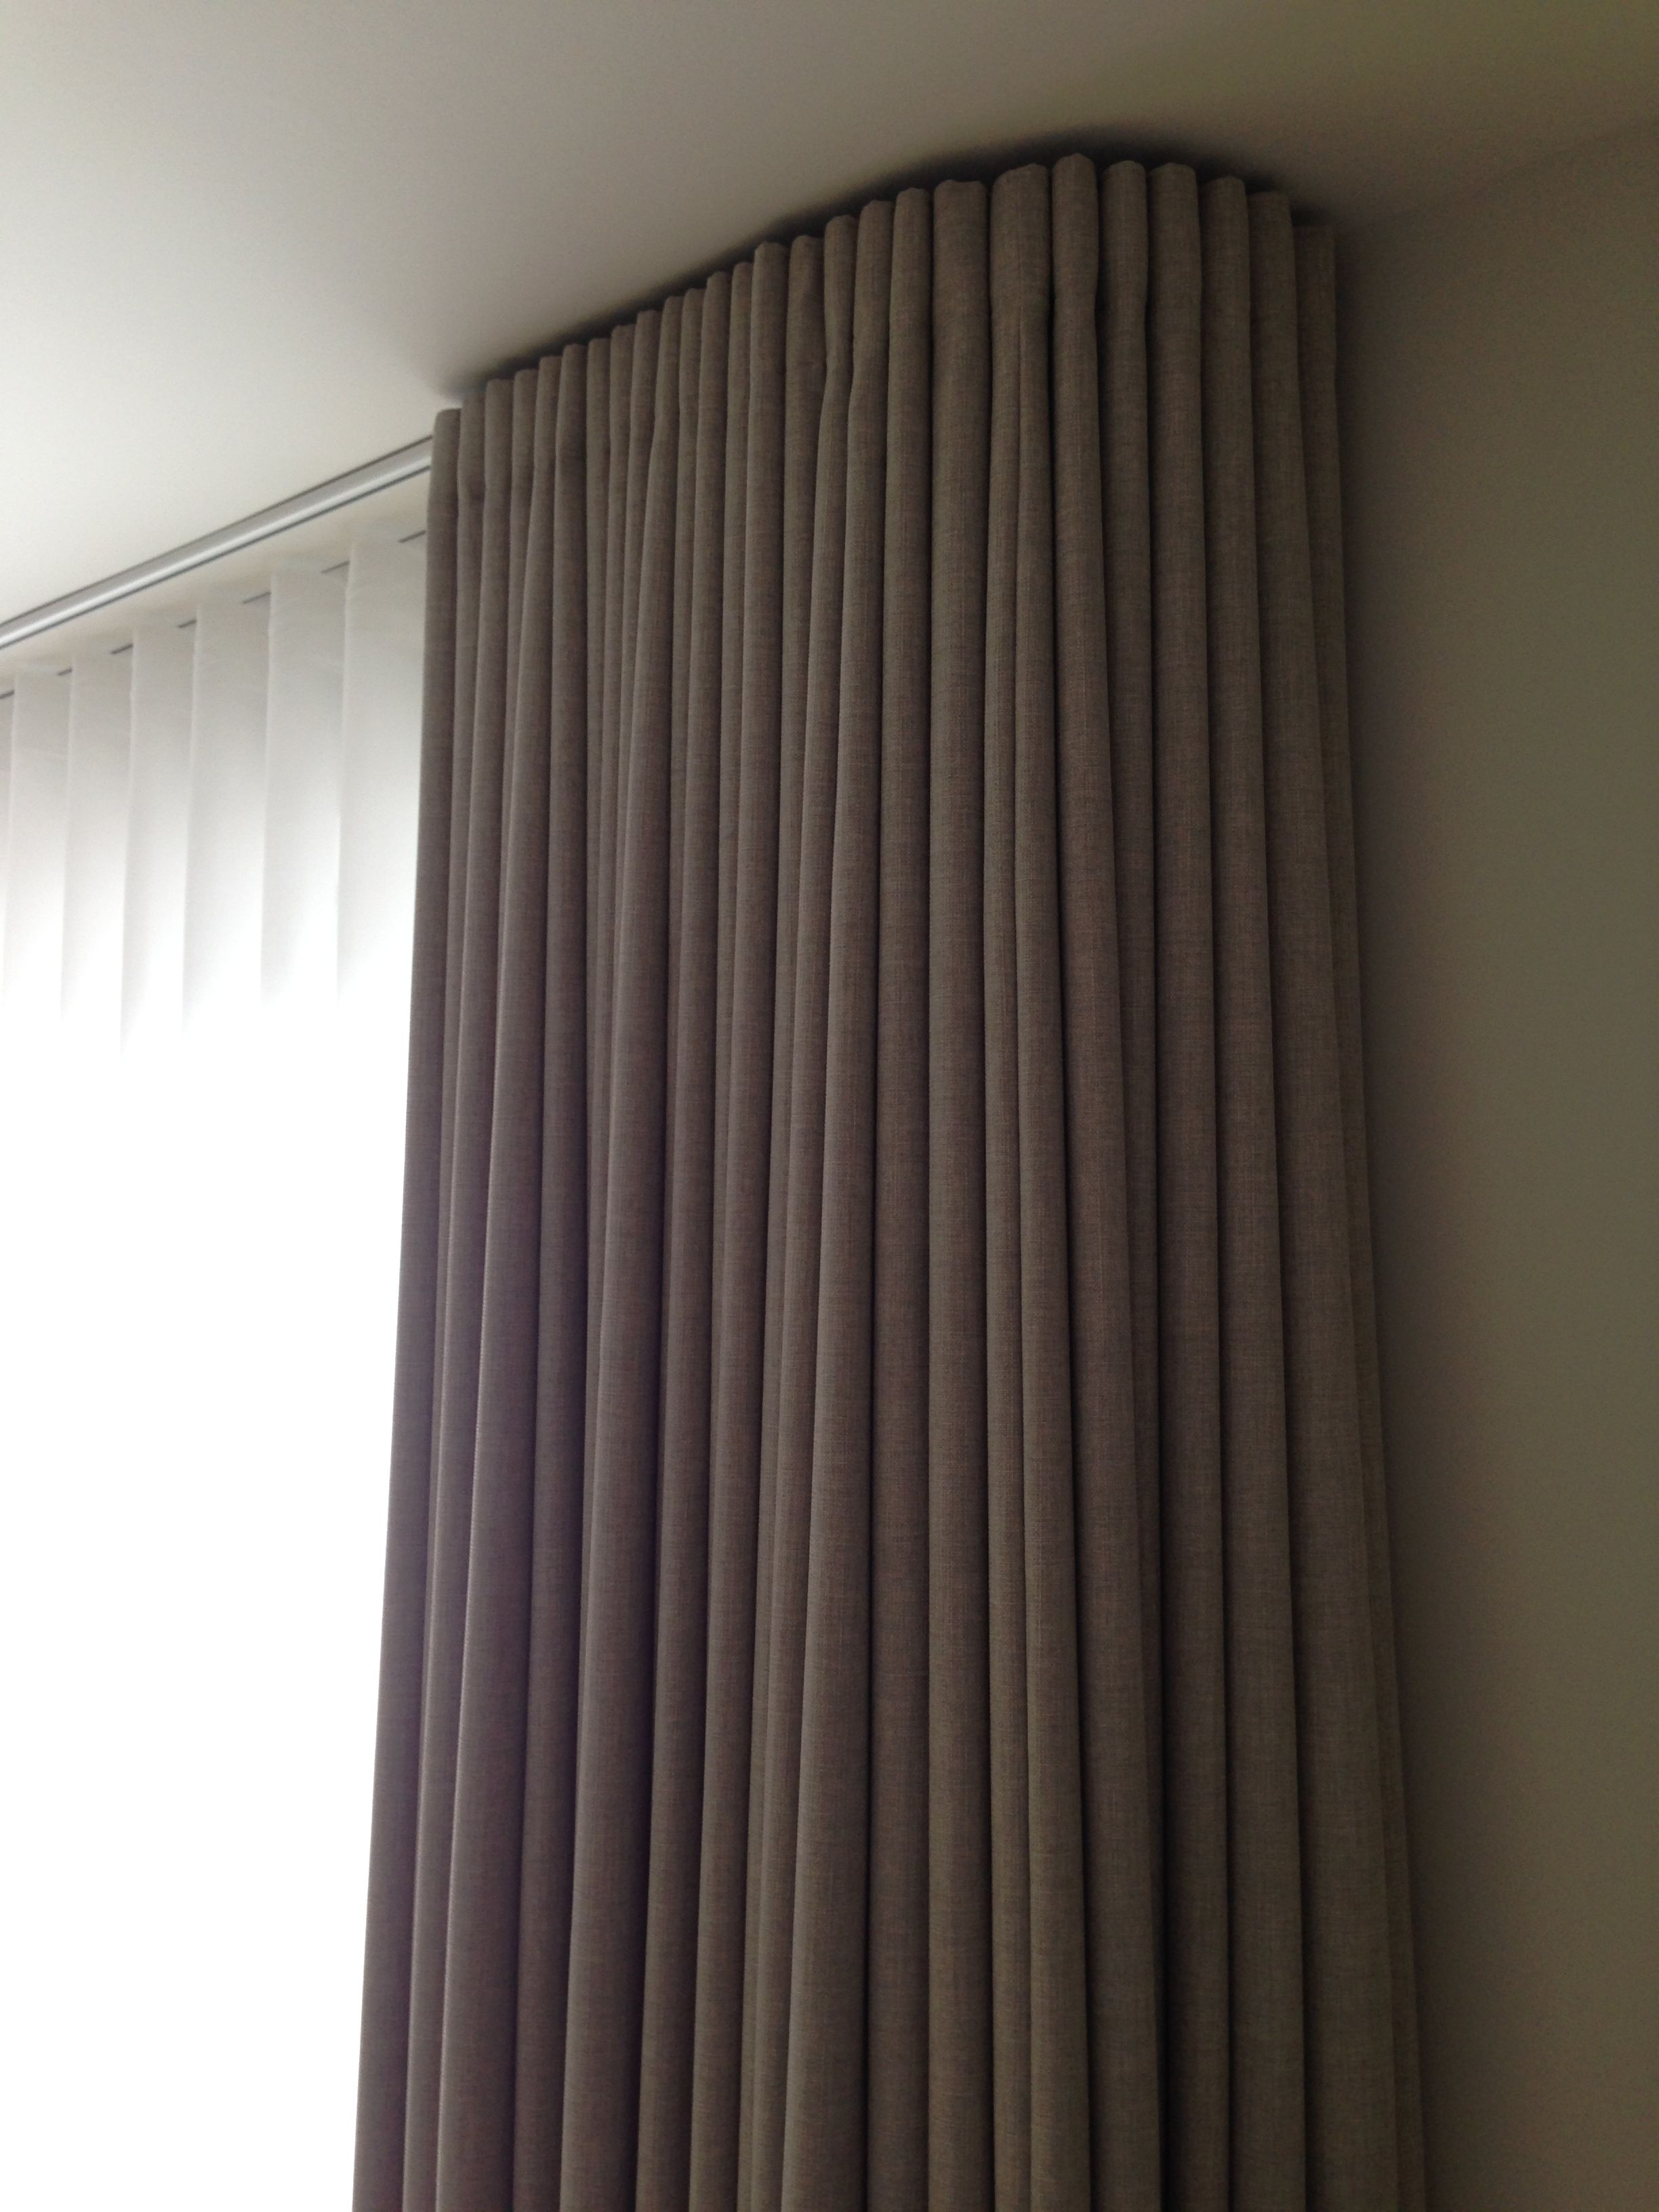 Curtains windows pinterest window interiors and curtain ideas